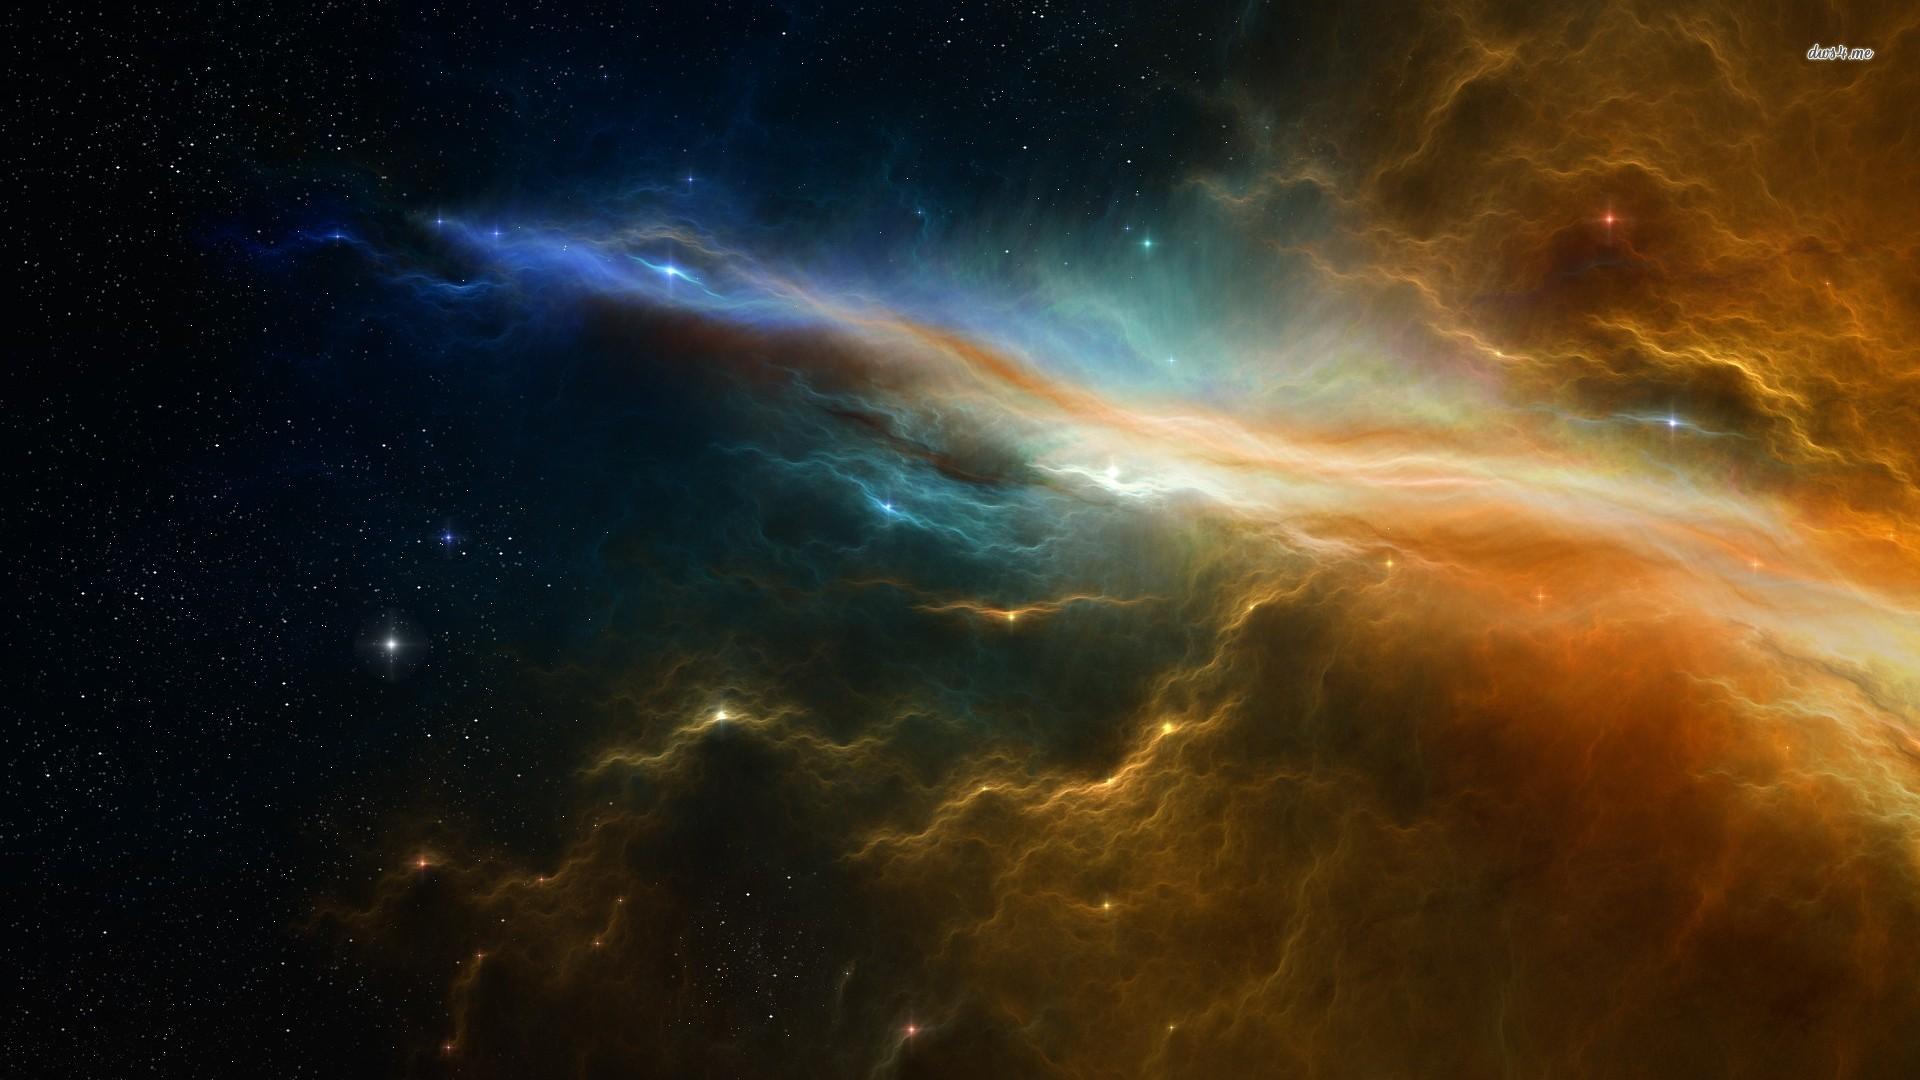 Space Nebula wallpaper   1159572 1920x1080